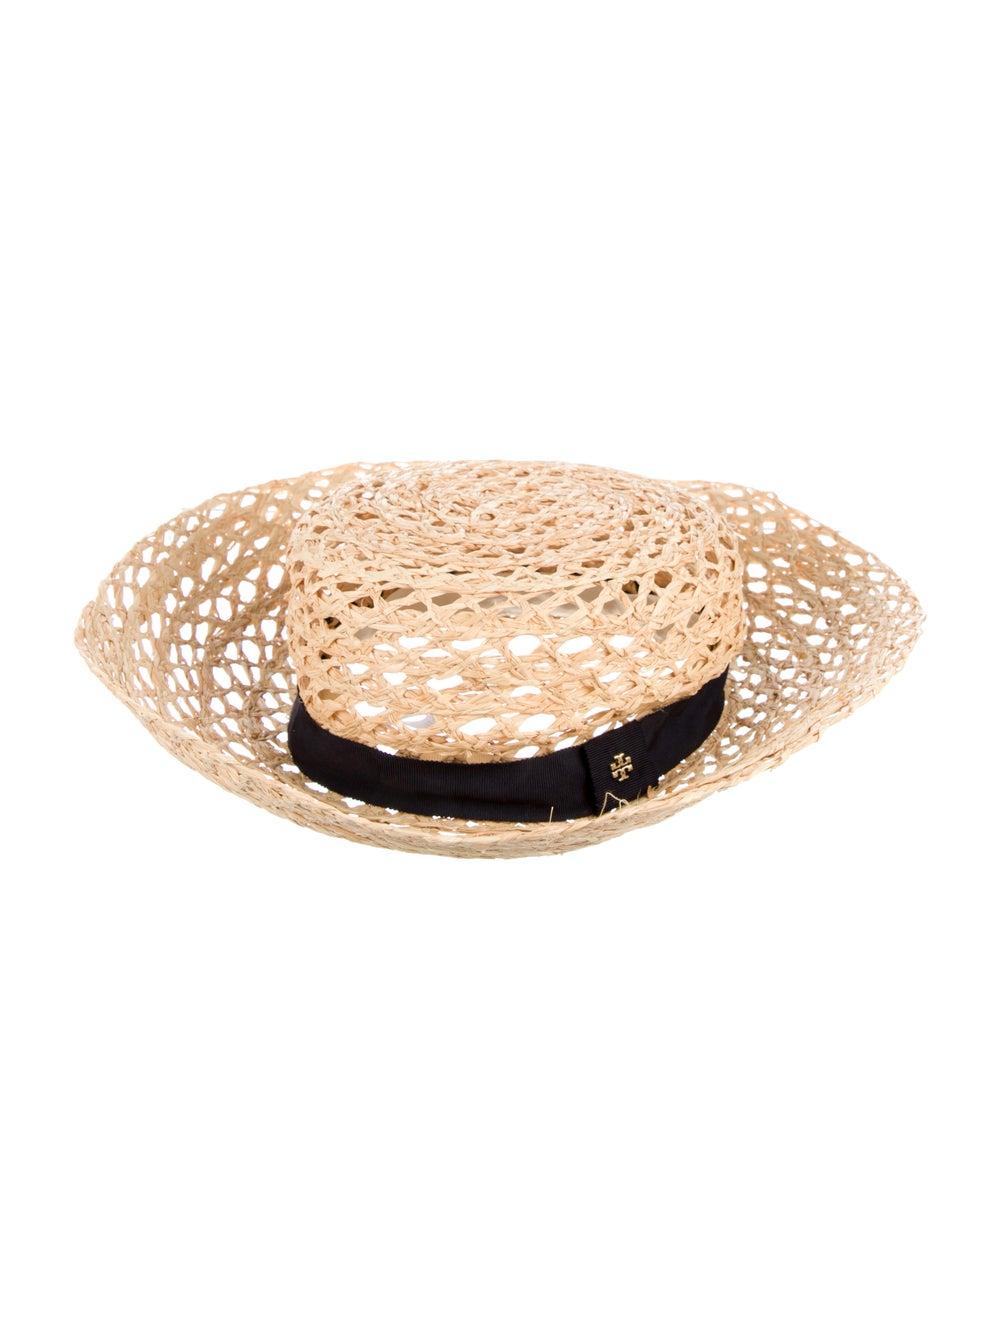 Tory Burch Wide Brim Straw Hat Tan - image 2